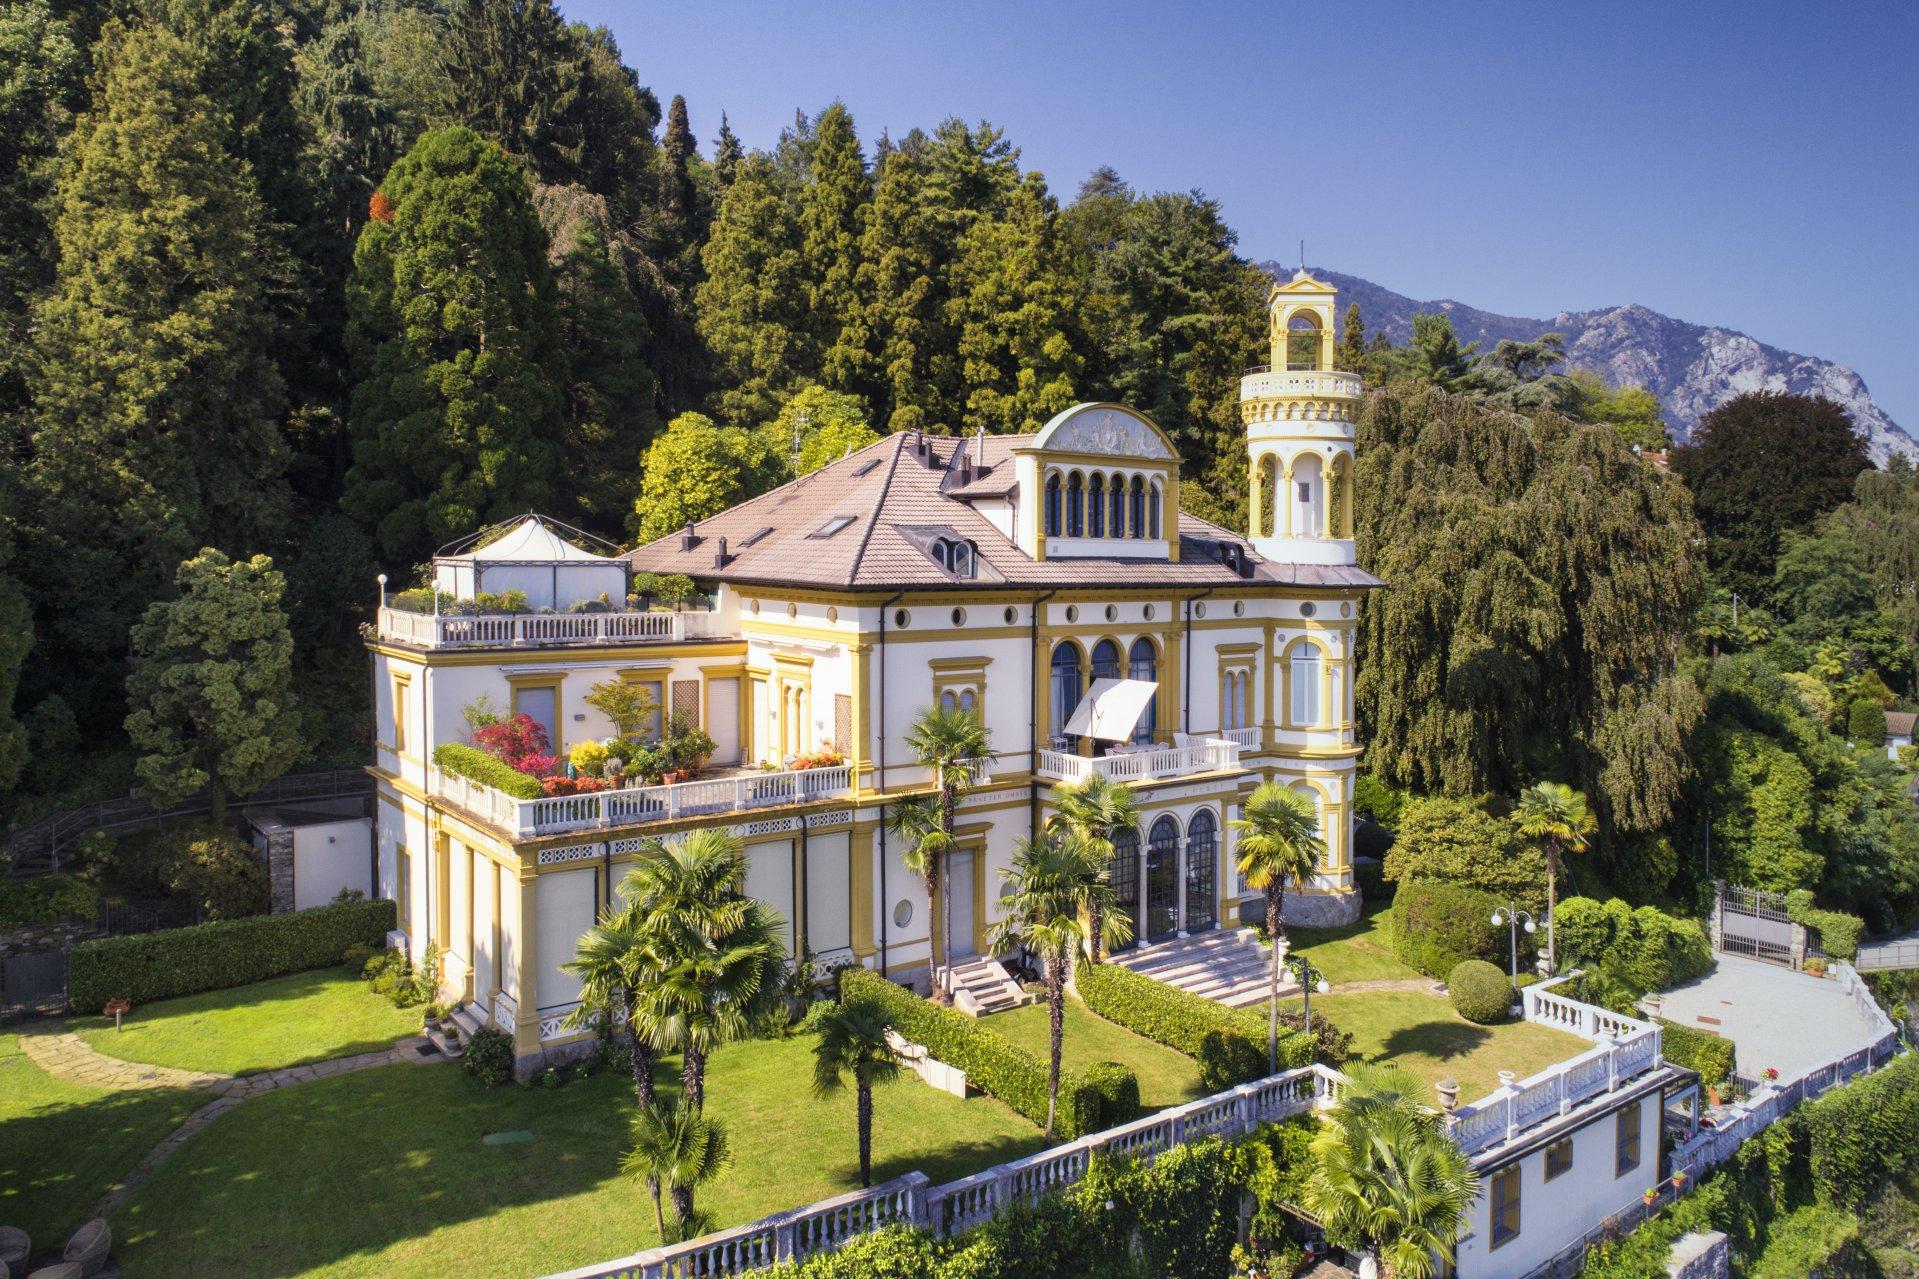 Apartment for sale in Baveno, inside a historic lake front villa - property facade